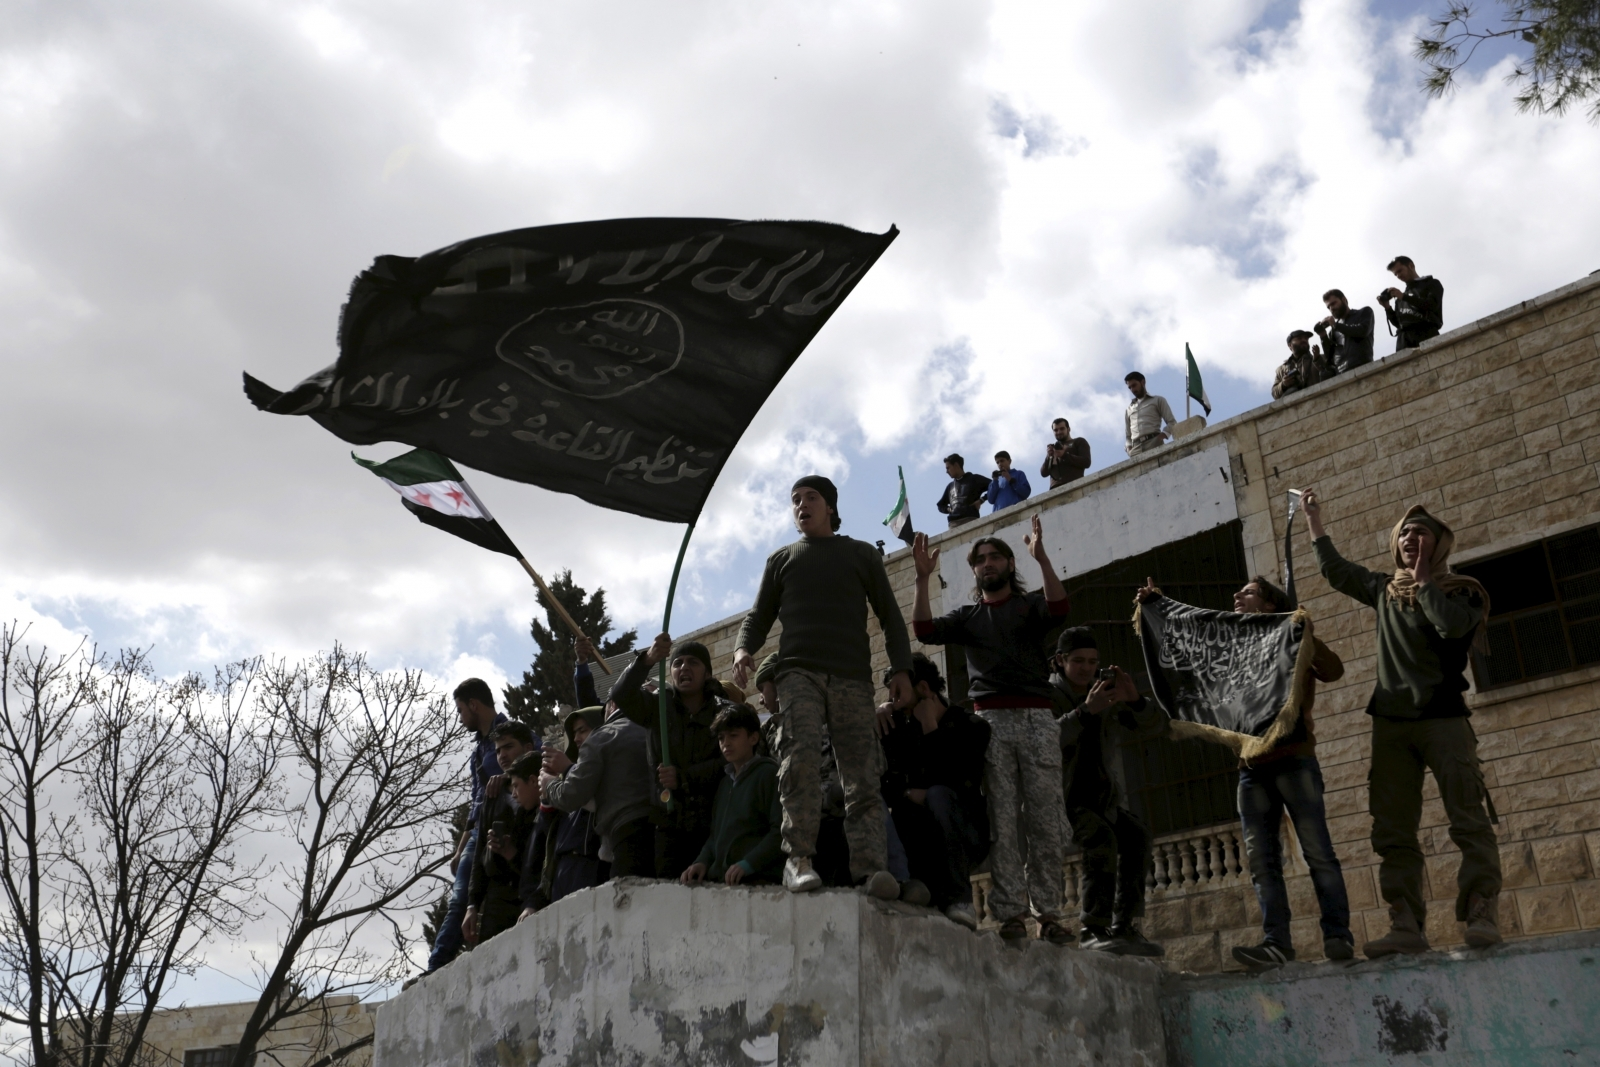 Al-Qaeda flag